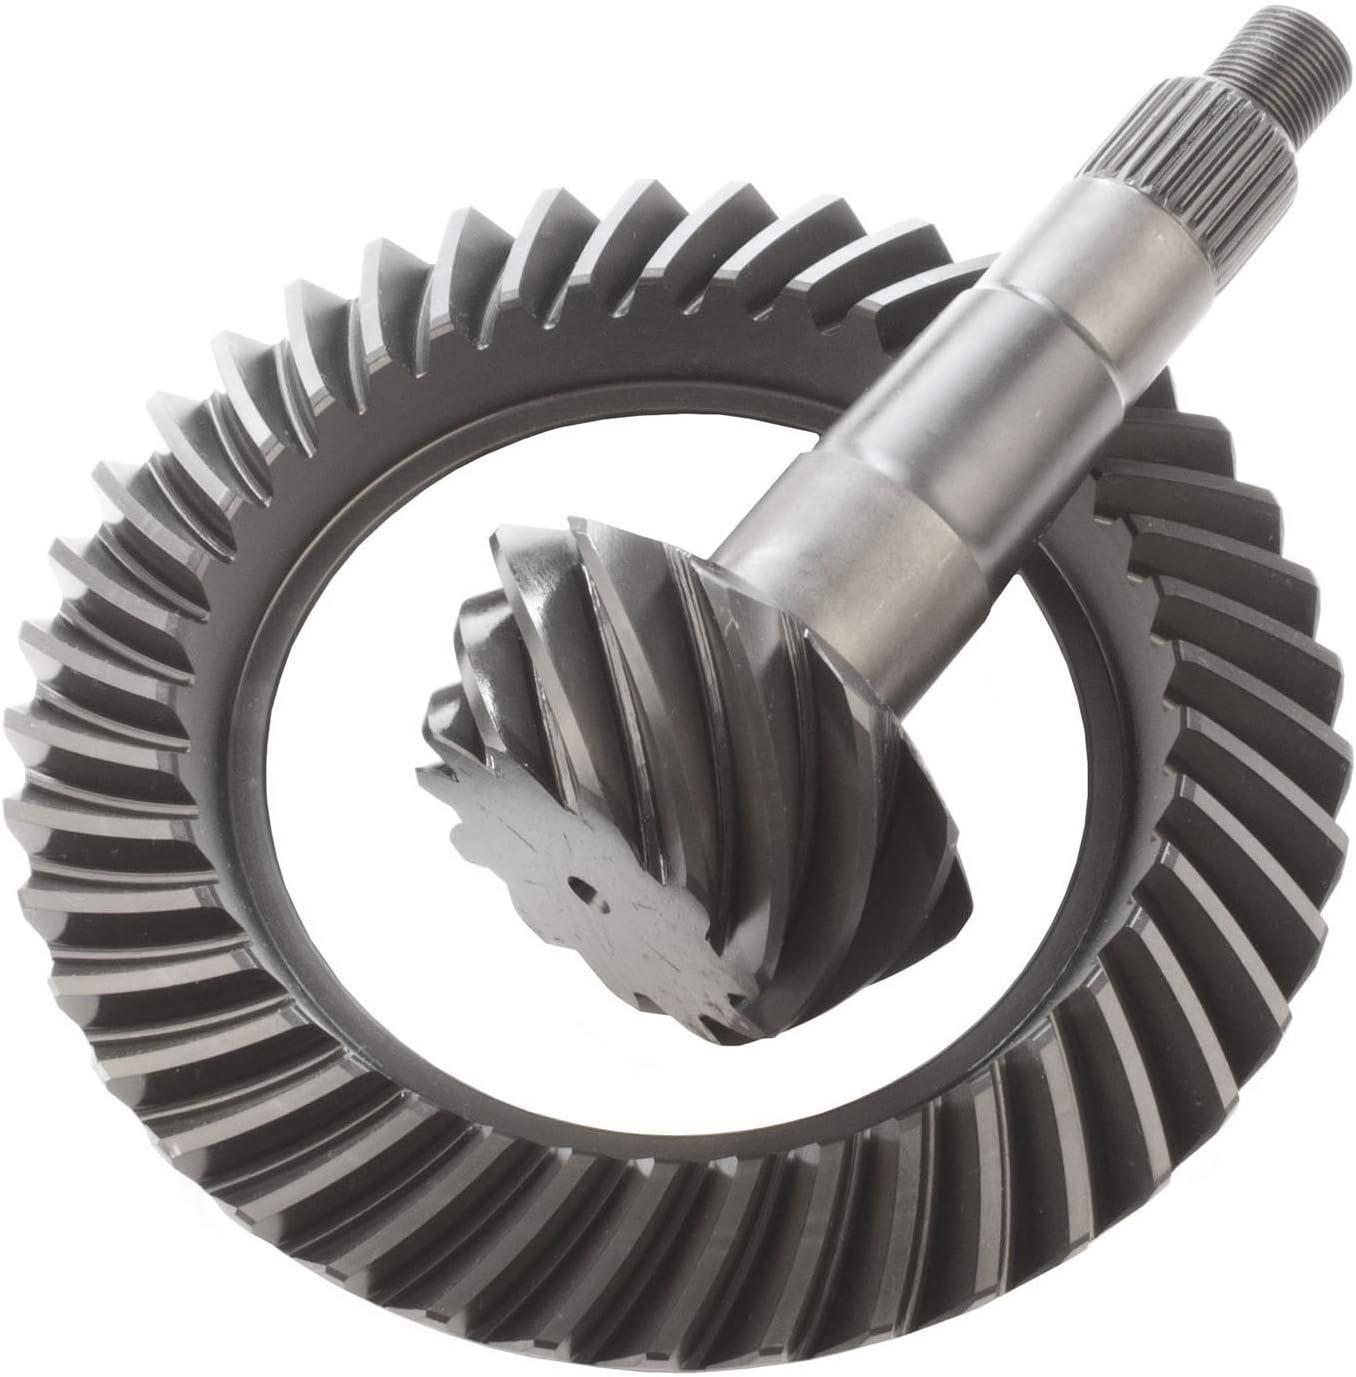 Richmond Gear 49-0039-1 Ring and Pinion GM 8.875 3.73 Car Ring Ratio 1 Pack [並行輸入品]